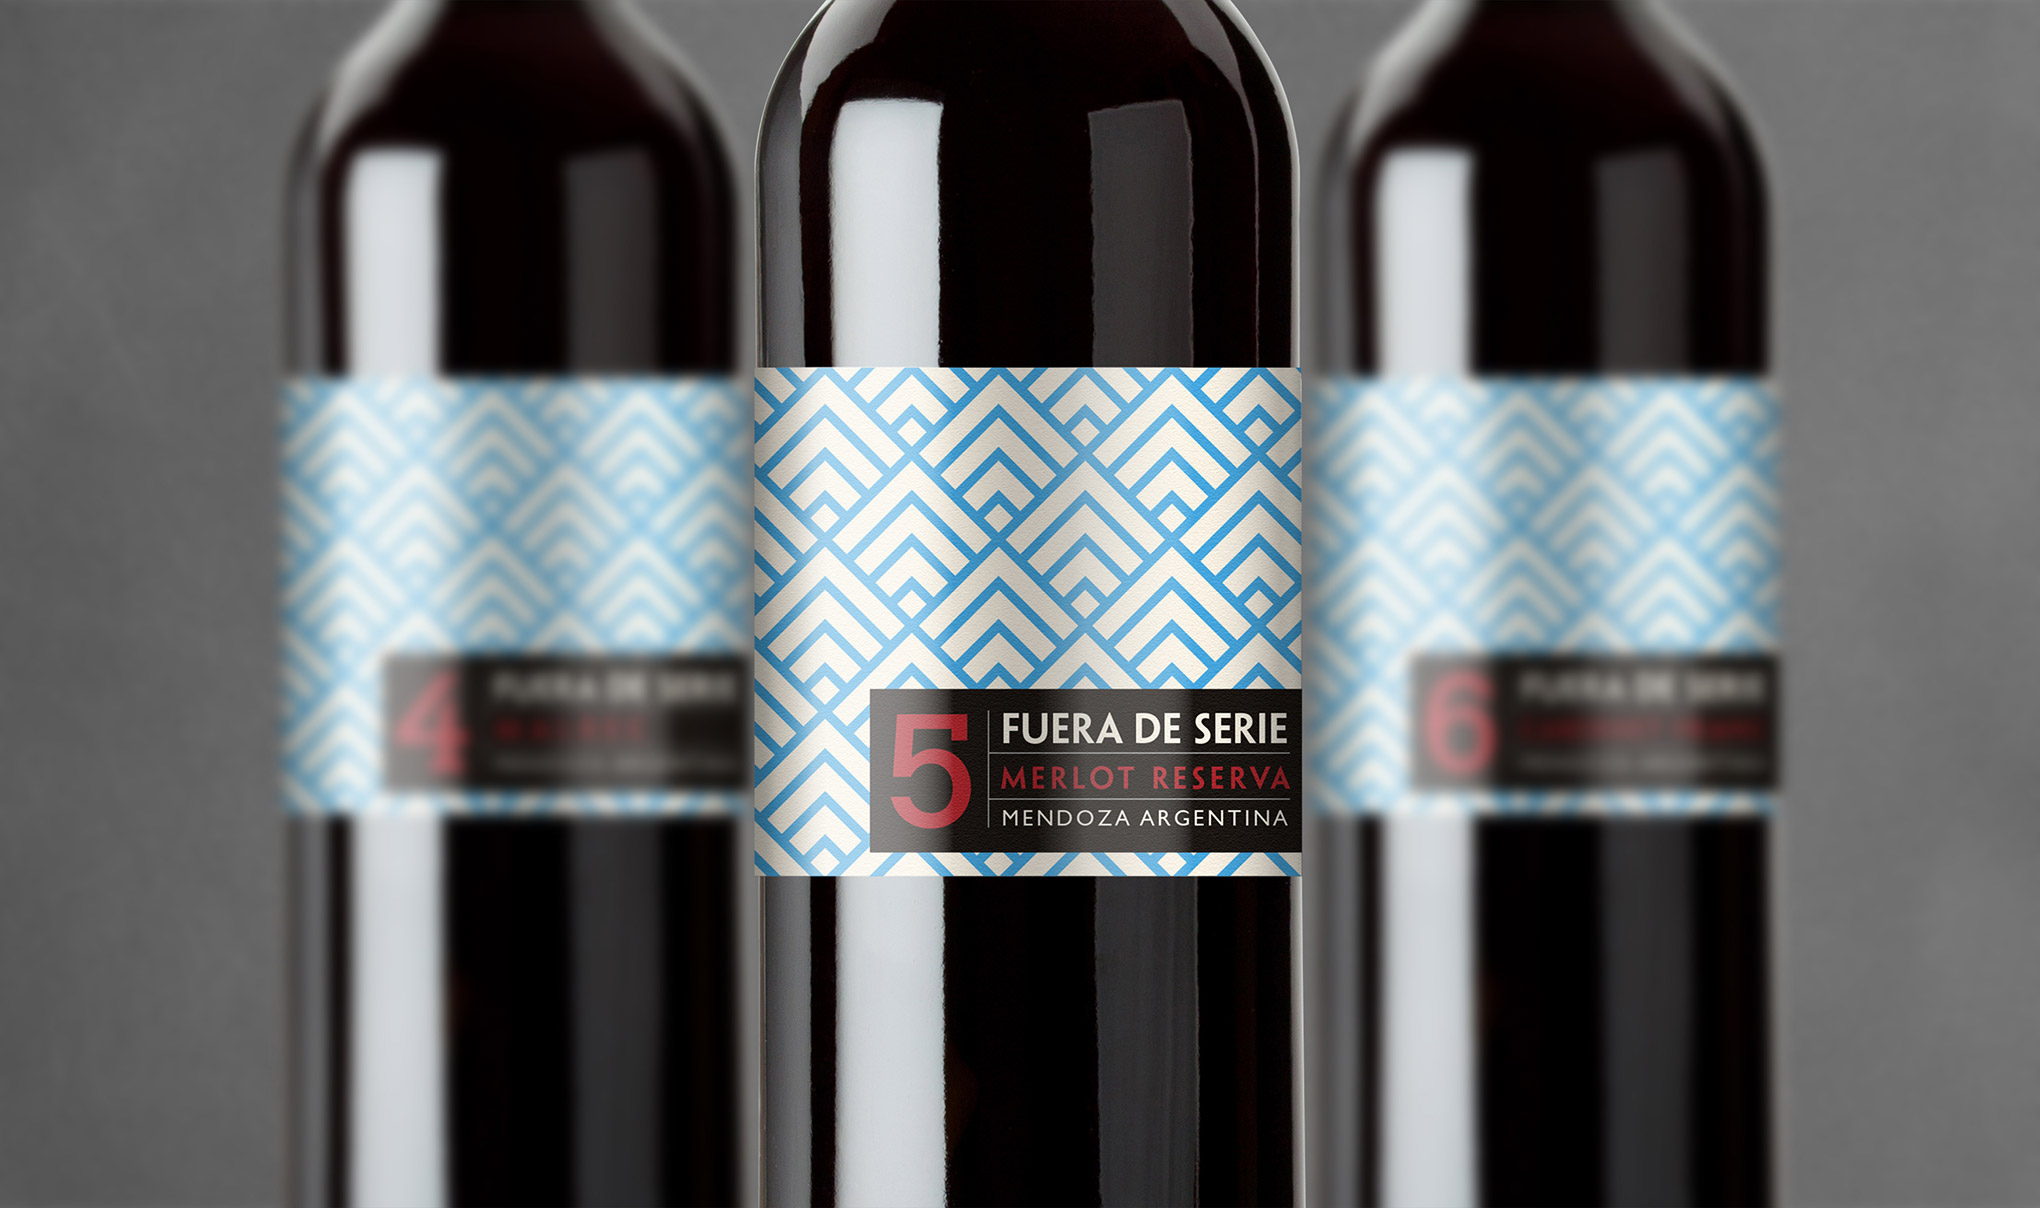 Wine label design for Fuera De Serie wine. Designed for Gaucho restaurants by creative agency, Flipflop Design Ltd.